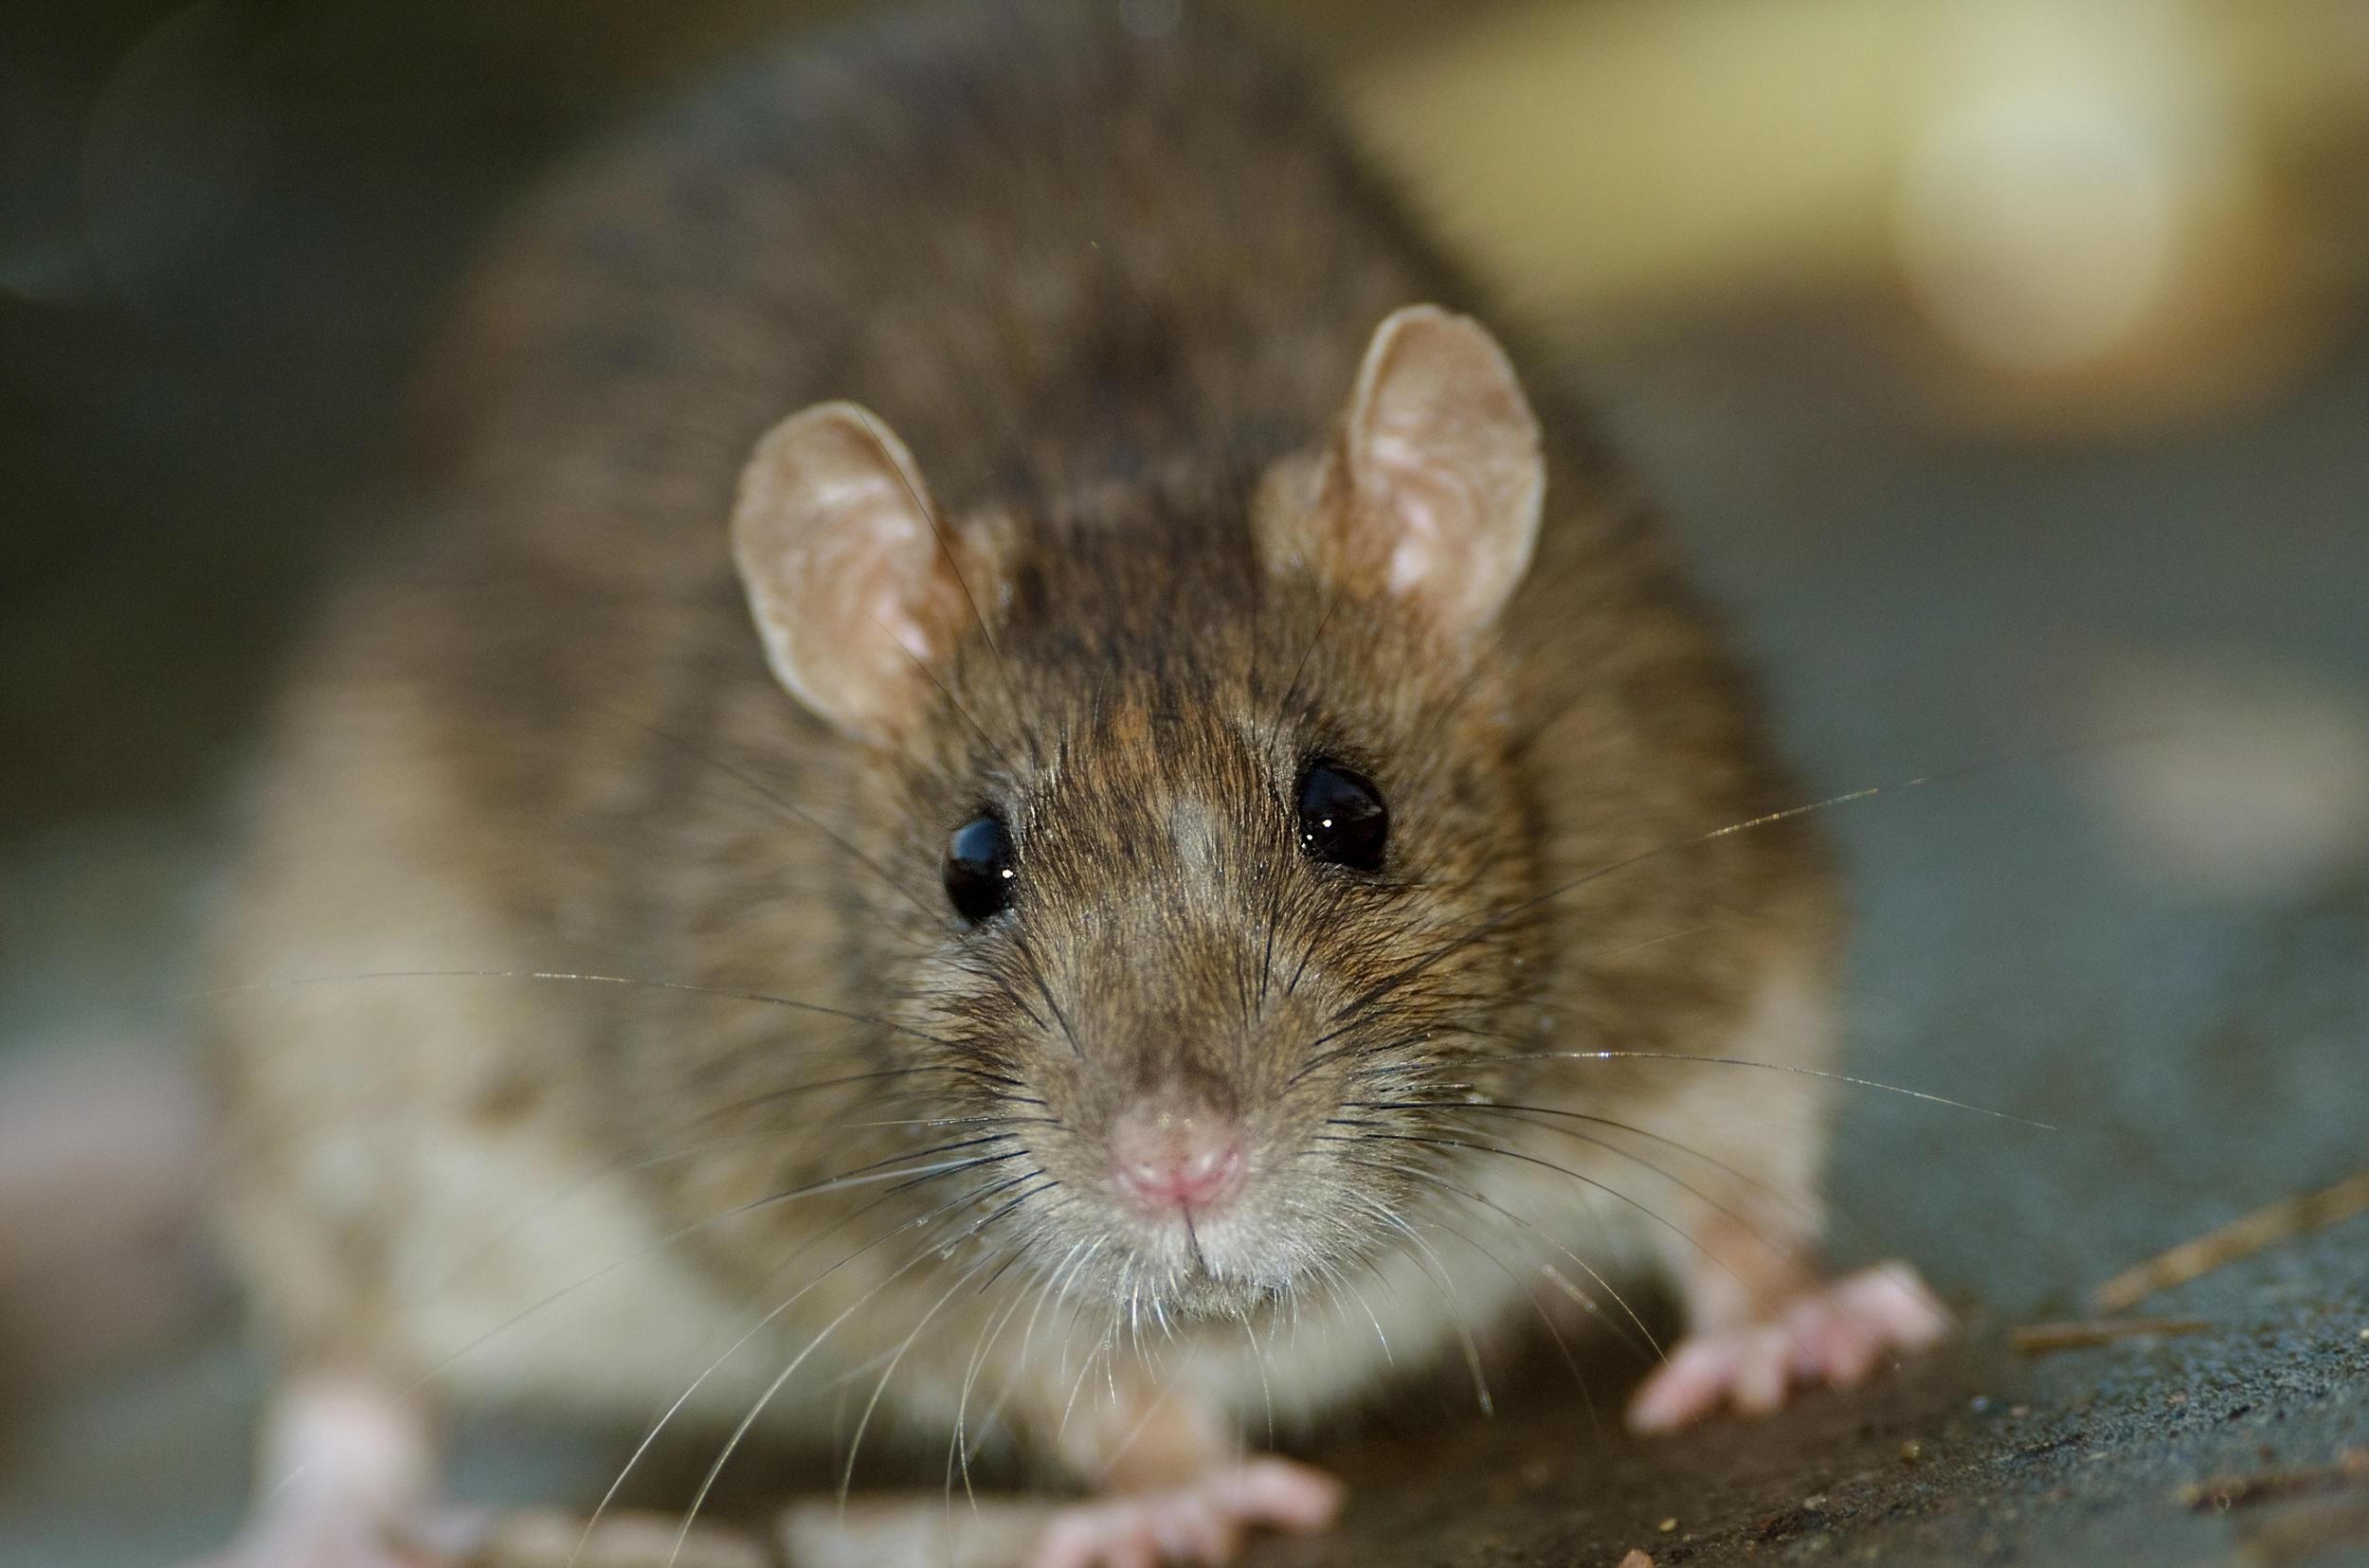 8 people infected in rare U.S. outbreak of rat virus - CBS News